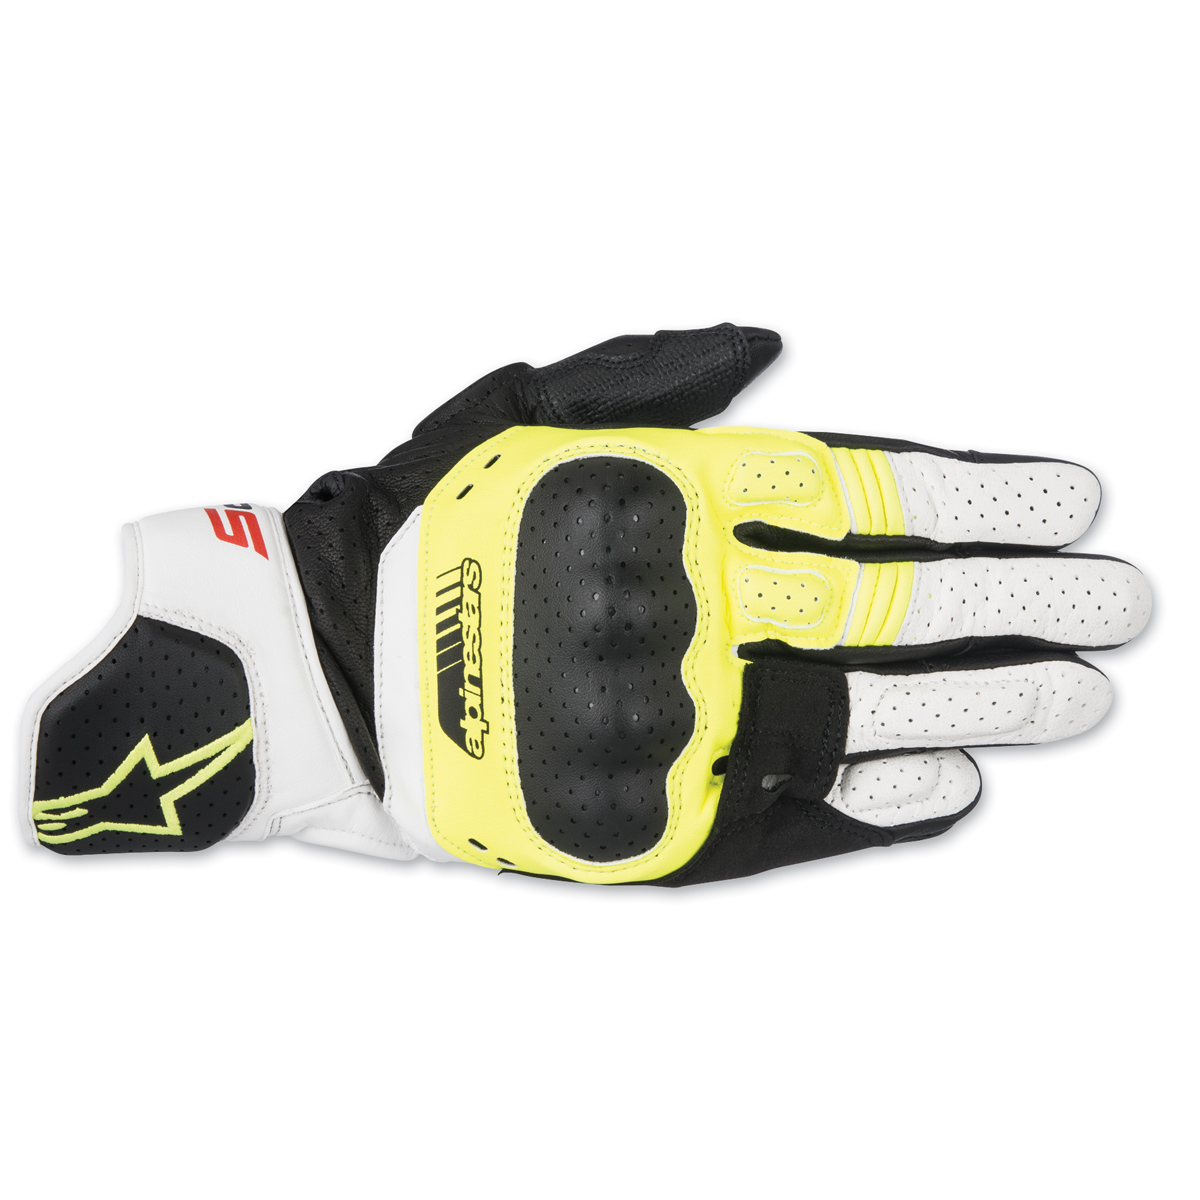 Alpinestars Men's SP-5 Black/Yellow/White Leather Gloves